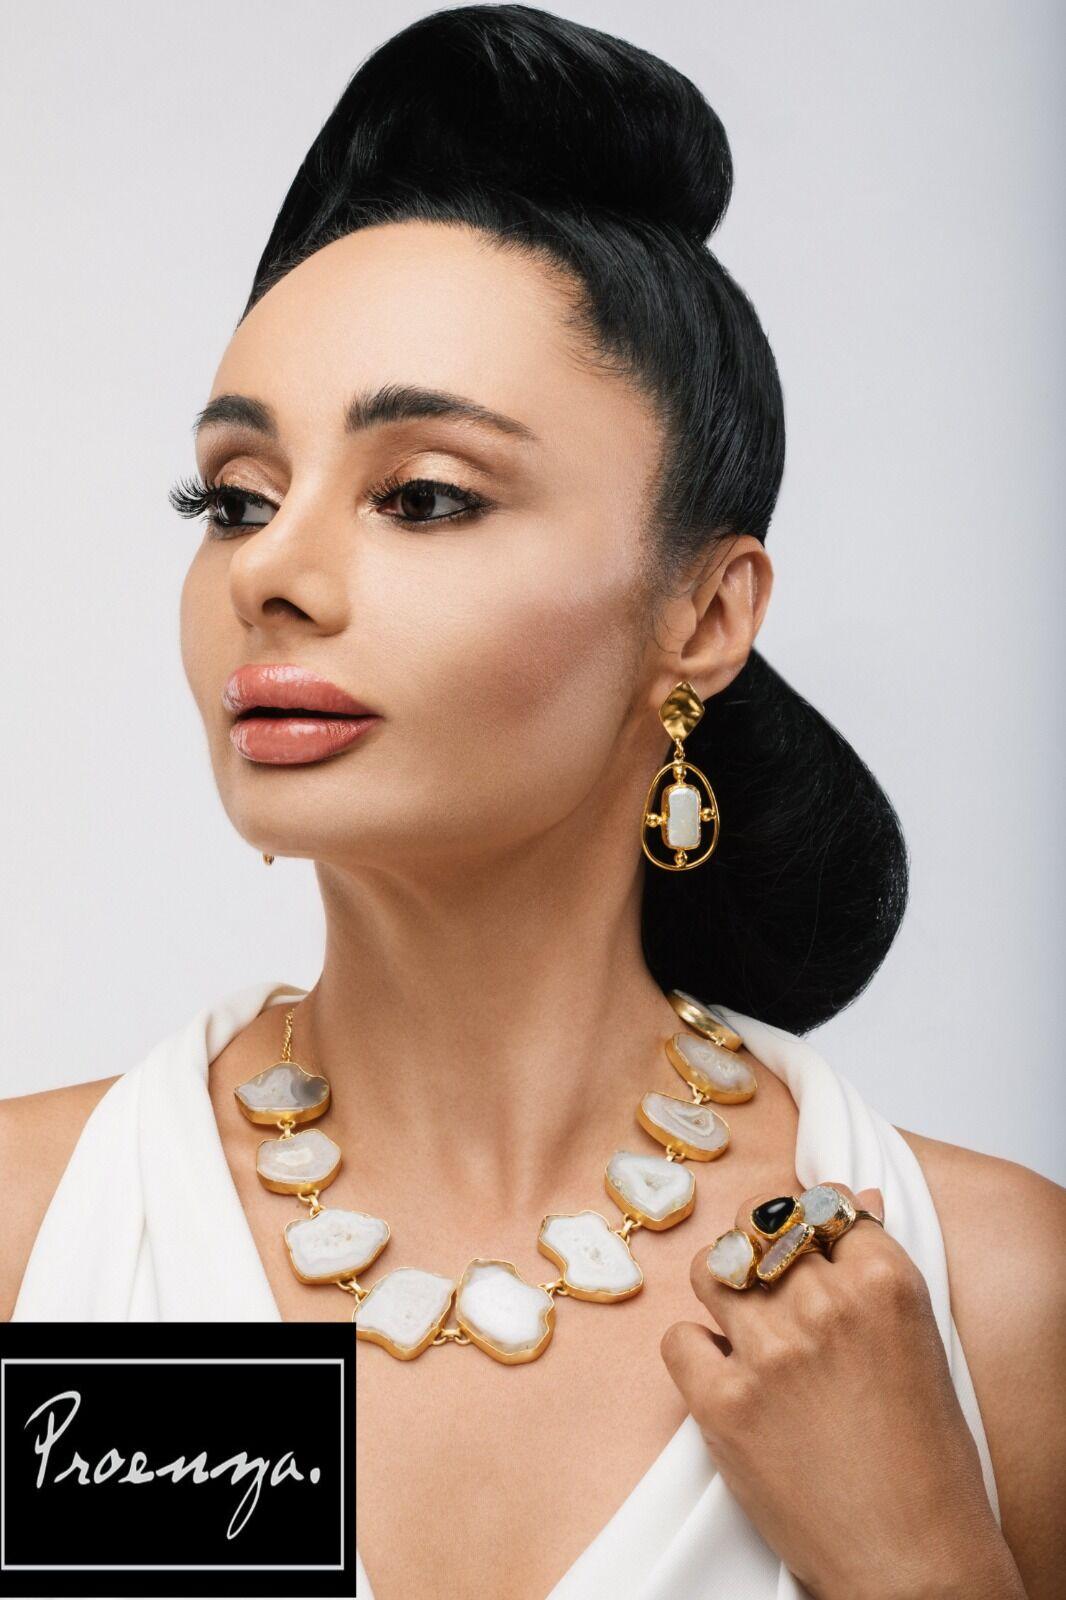 Proenza Jewellery